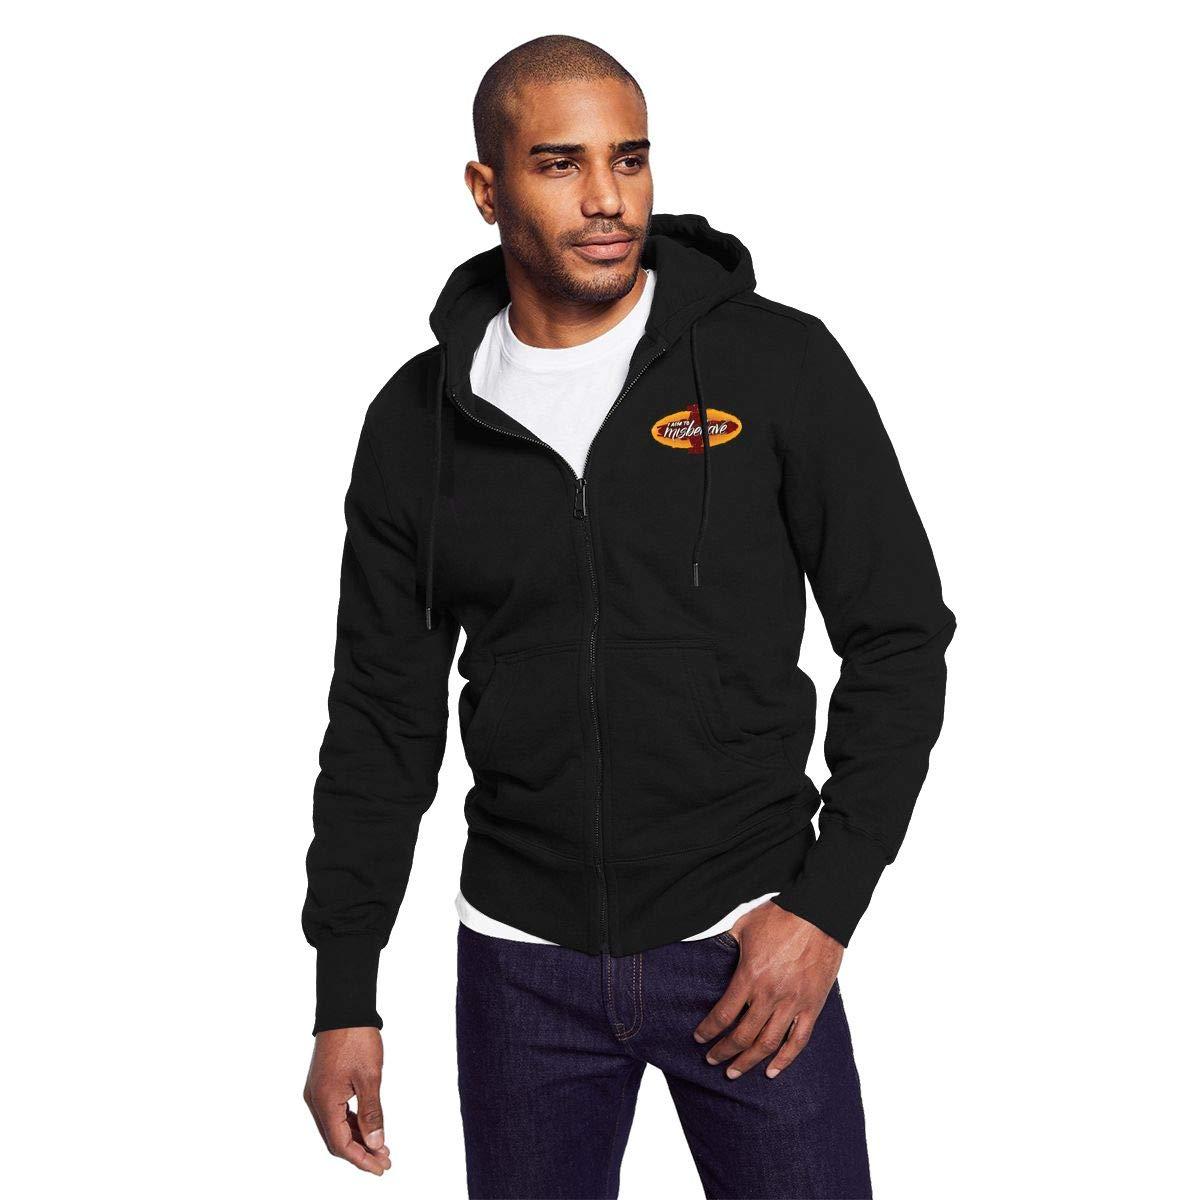 Slim Fit Lightweight Long Sleeve Zip up Hoodie Unisex Hooded Fleece Sweatshirt